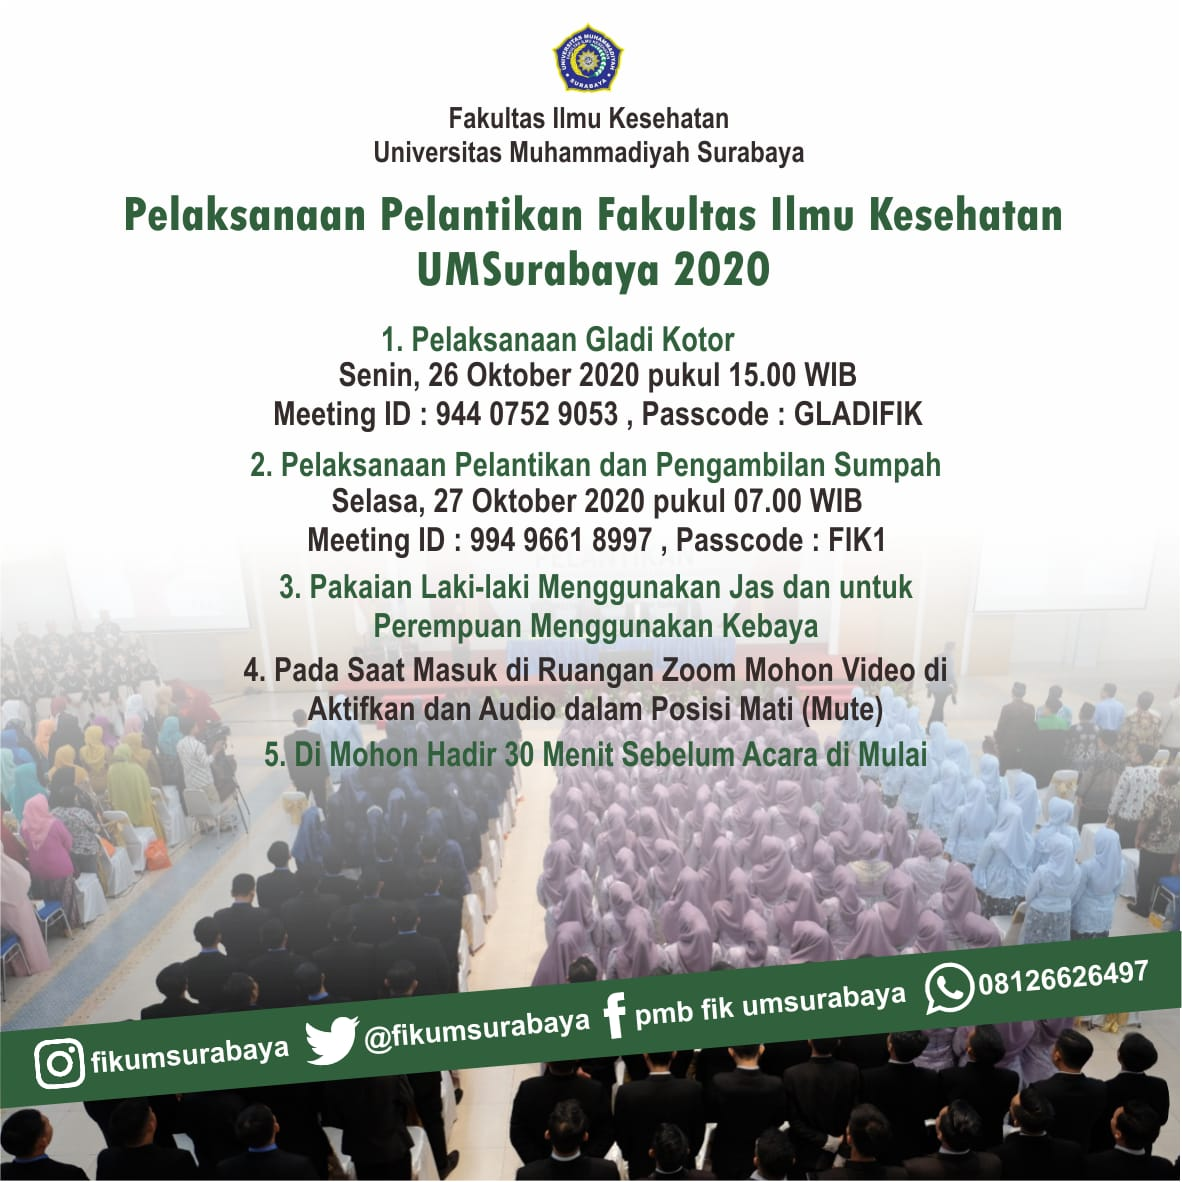 Pelantikan Fakultas Ilmu Kesehatan UM Surabaya